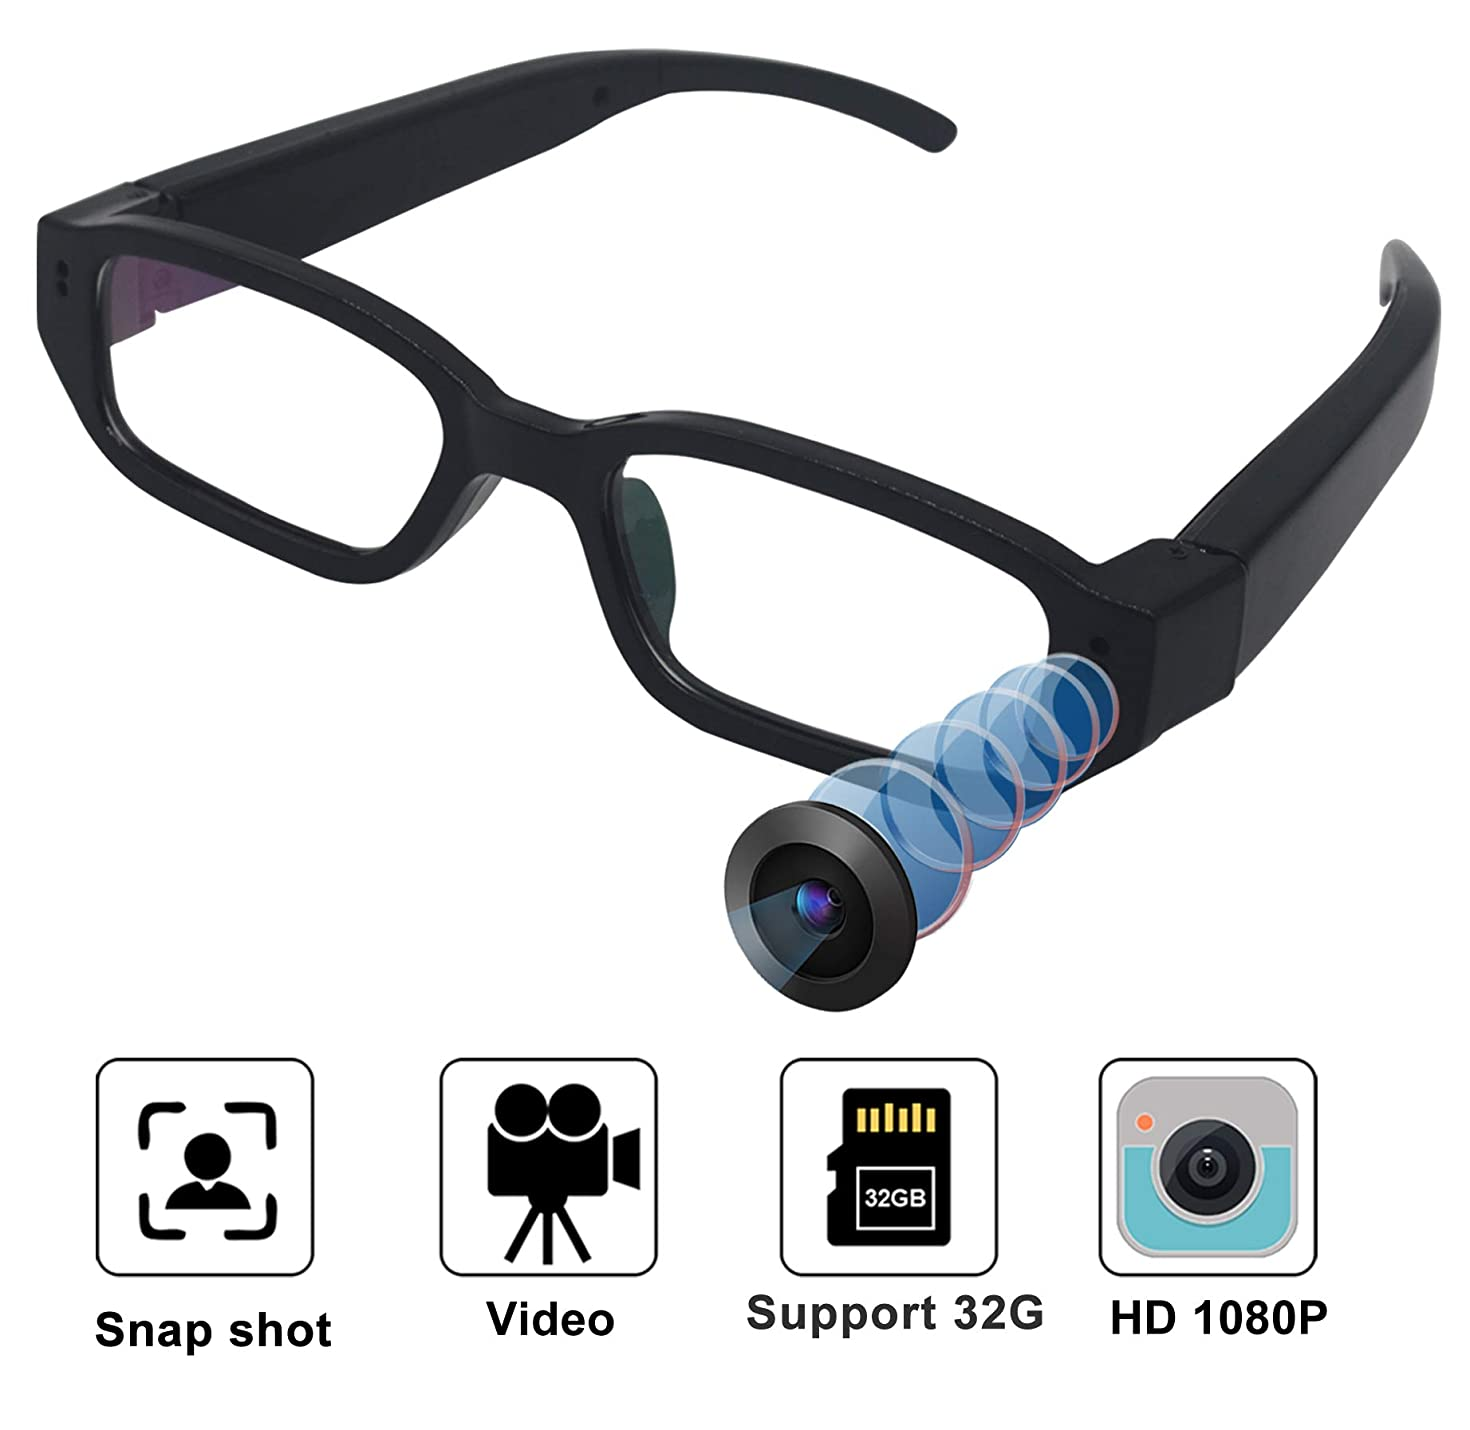 Hidden Camera - Spy Camera HD 1080P Glasses Camera - Mini Spy Camera - Hidden Camera Glasses Surveillance Camera Video-only Hidden Spy Cam No Wi-Fi Needed-No Audio No Support Bugging/Wiretapping